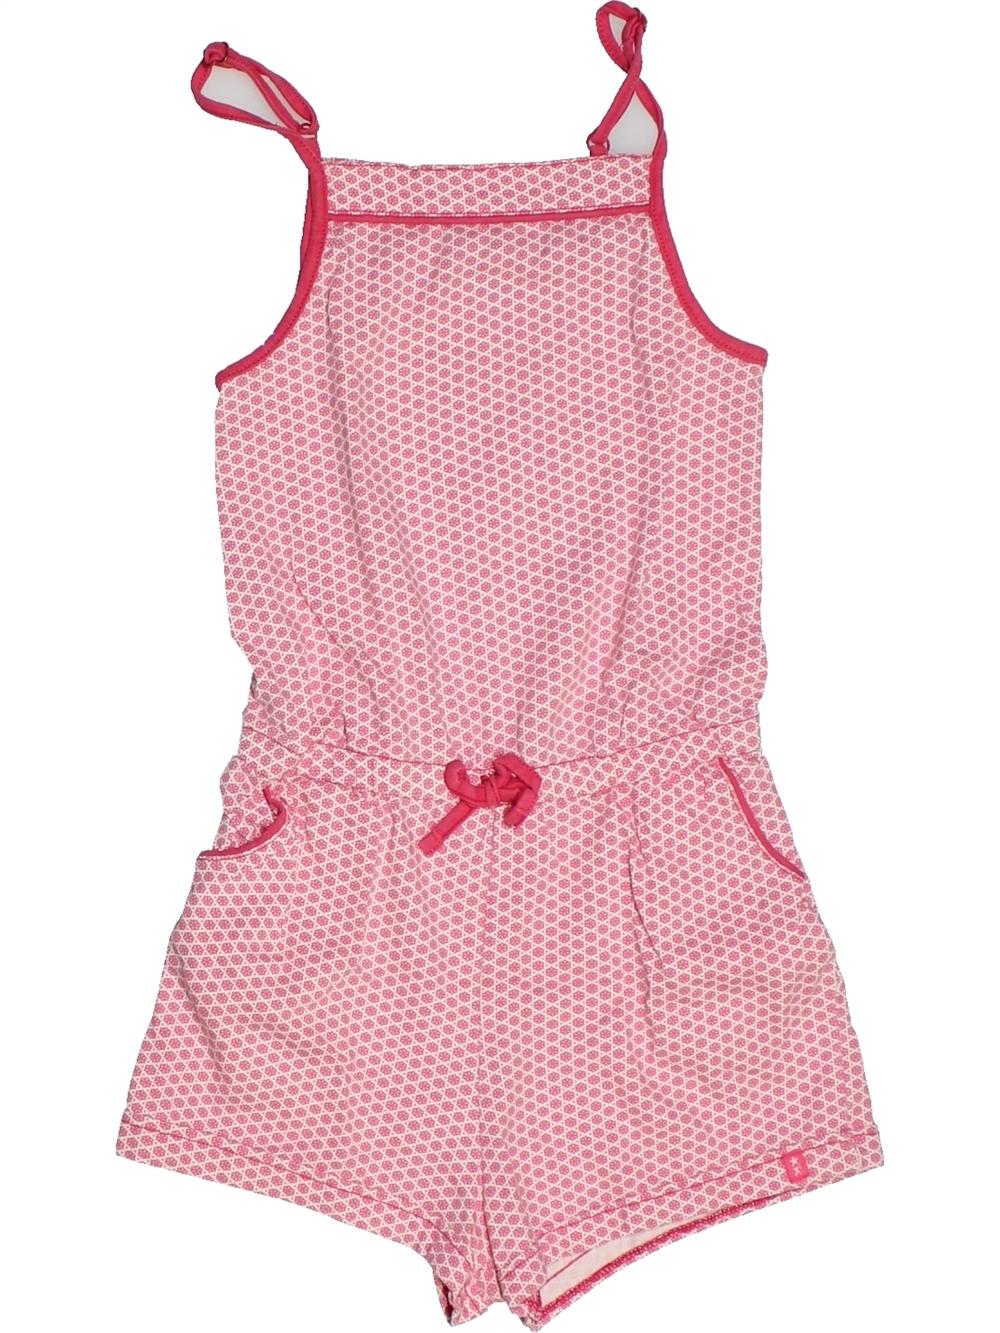 Combinaison-courte-enfant-fille-OKAIDI-8-ans-rose-ete-vetement-bebe-1093